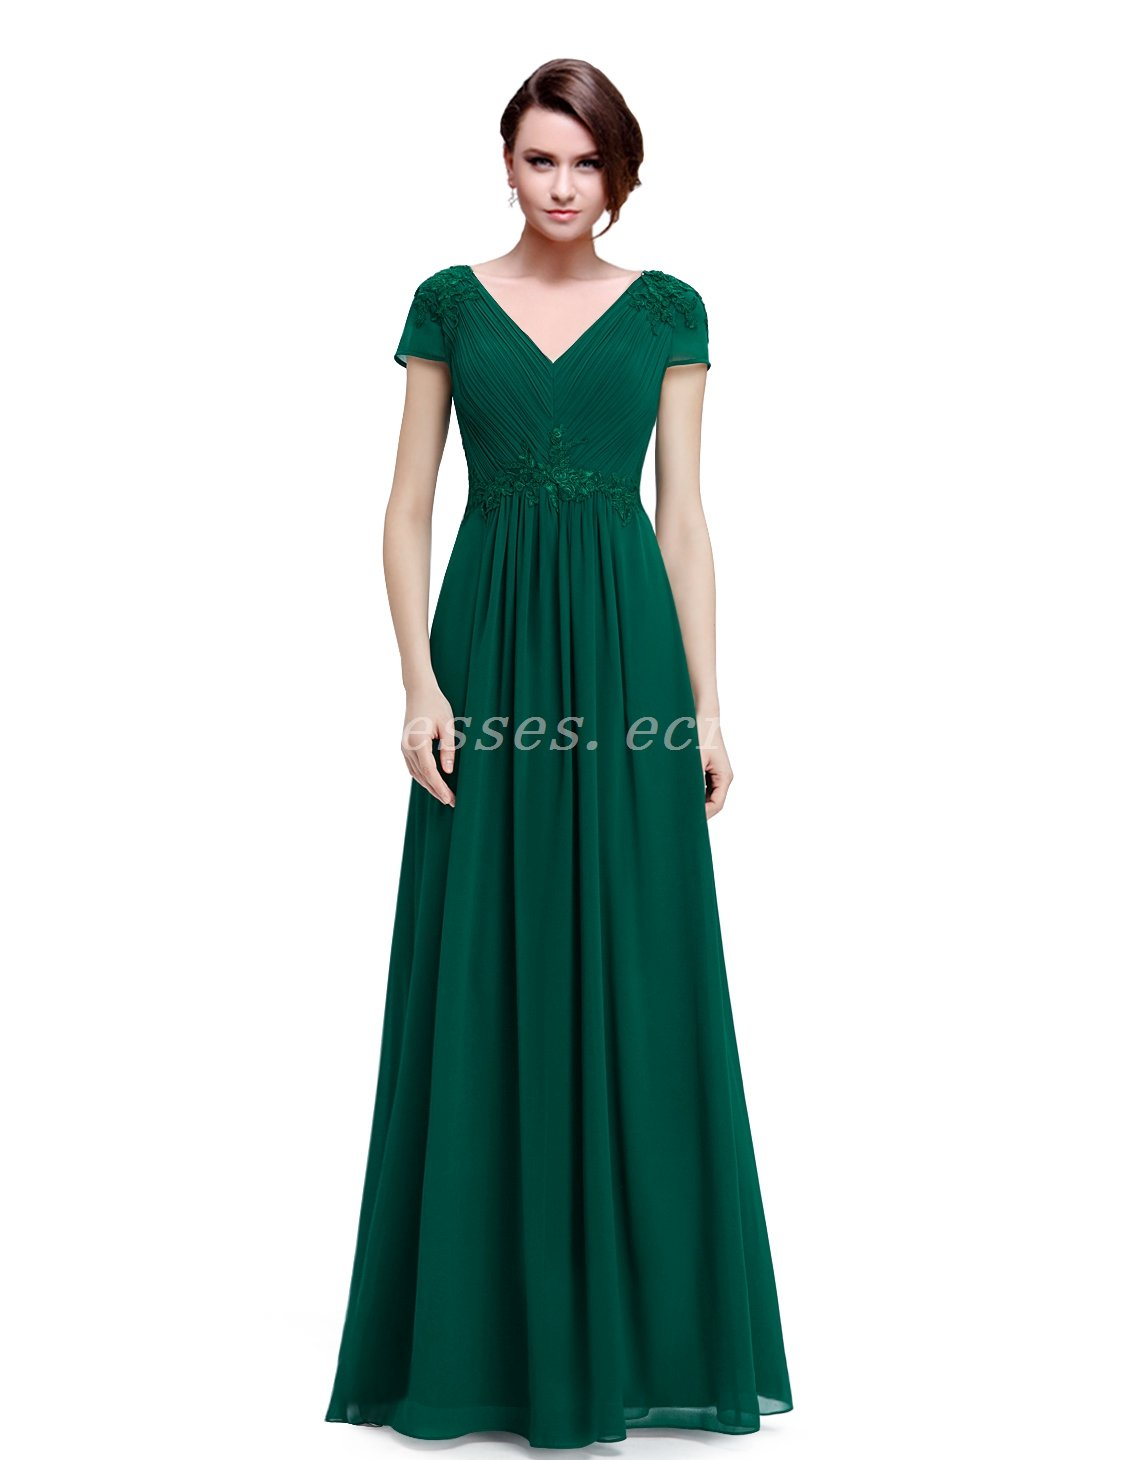 Short Sleeves V-Neckline Forest Green Chiffon Mother Of The Bride Dress